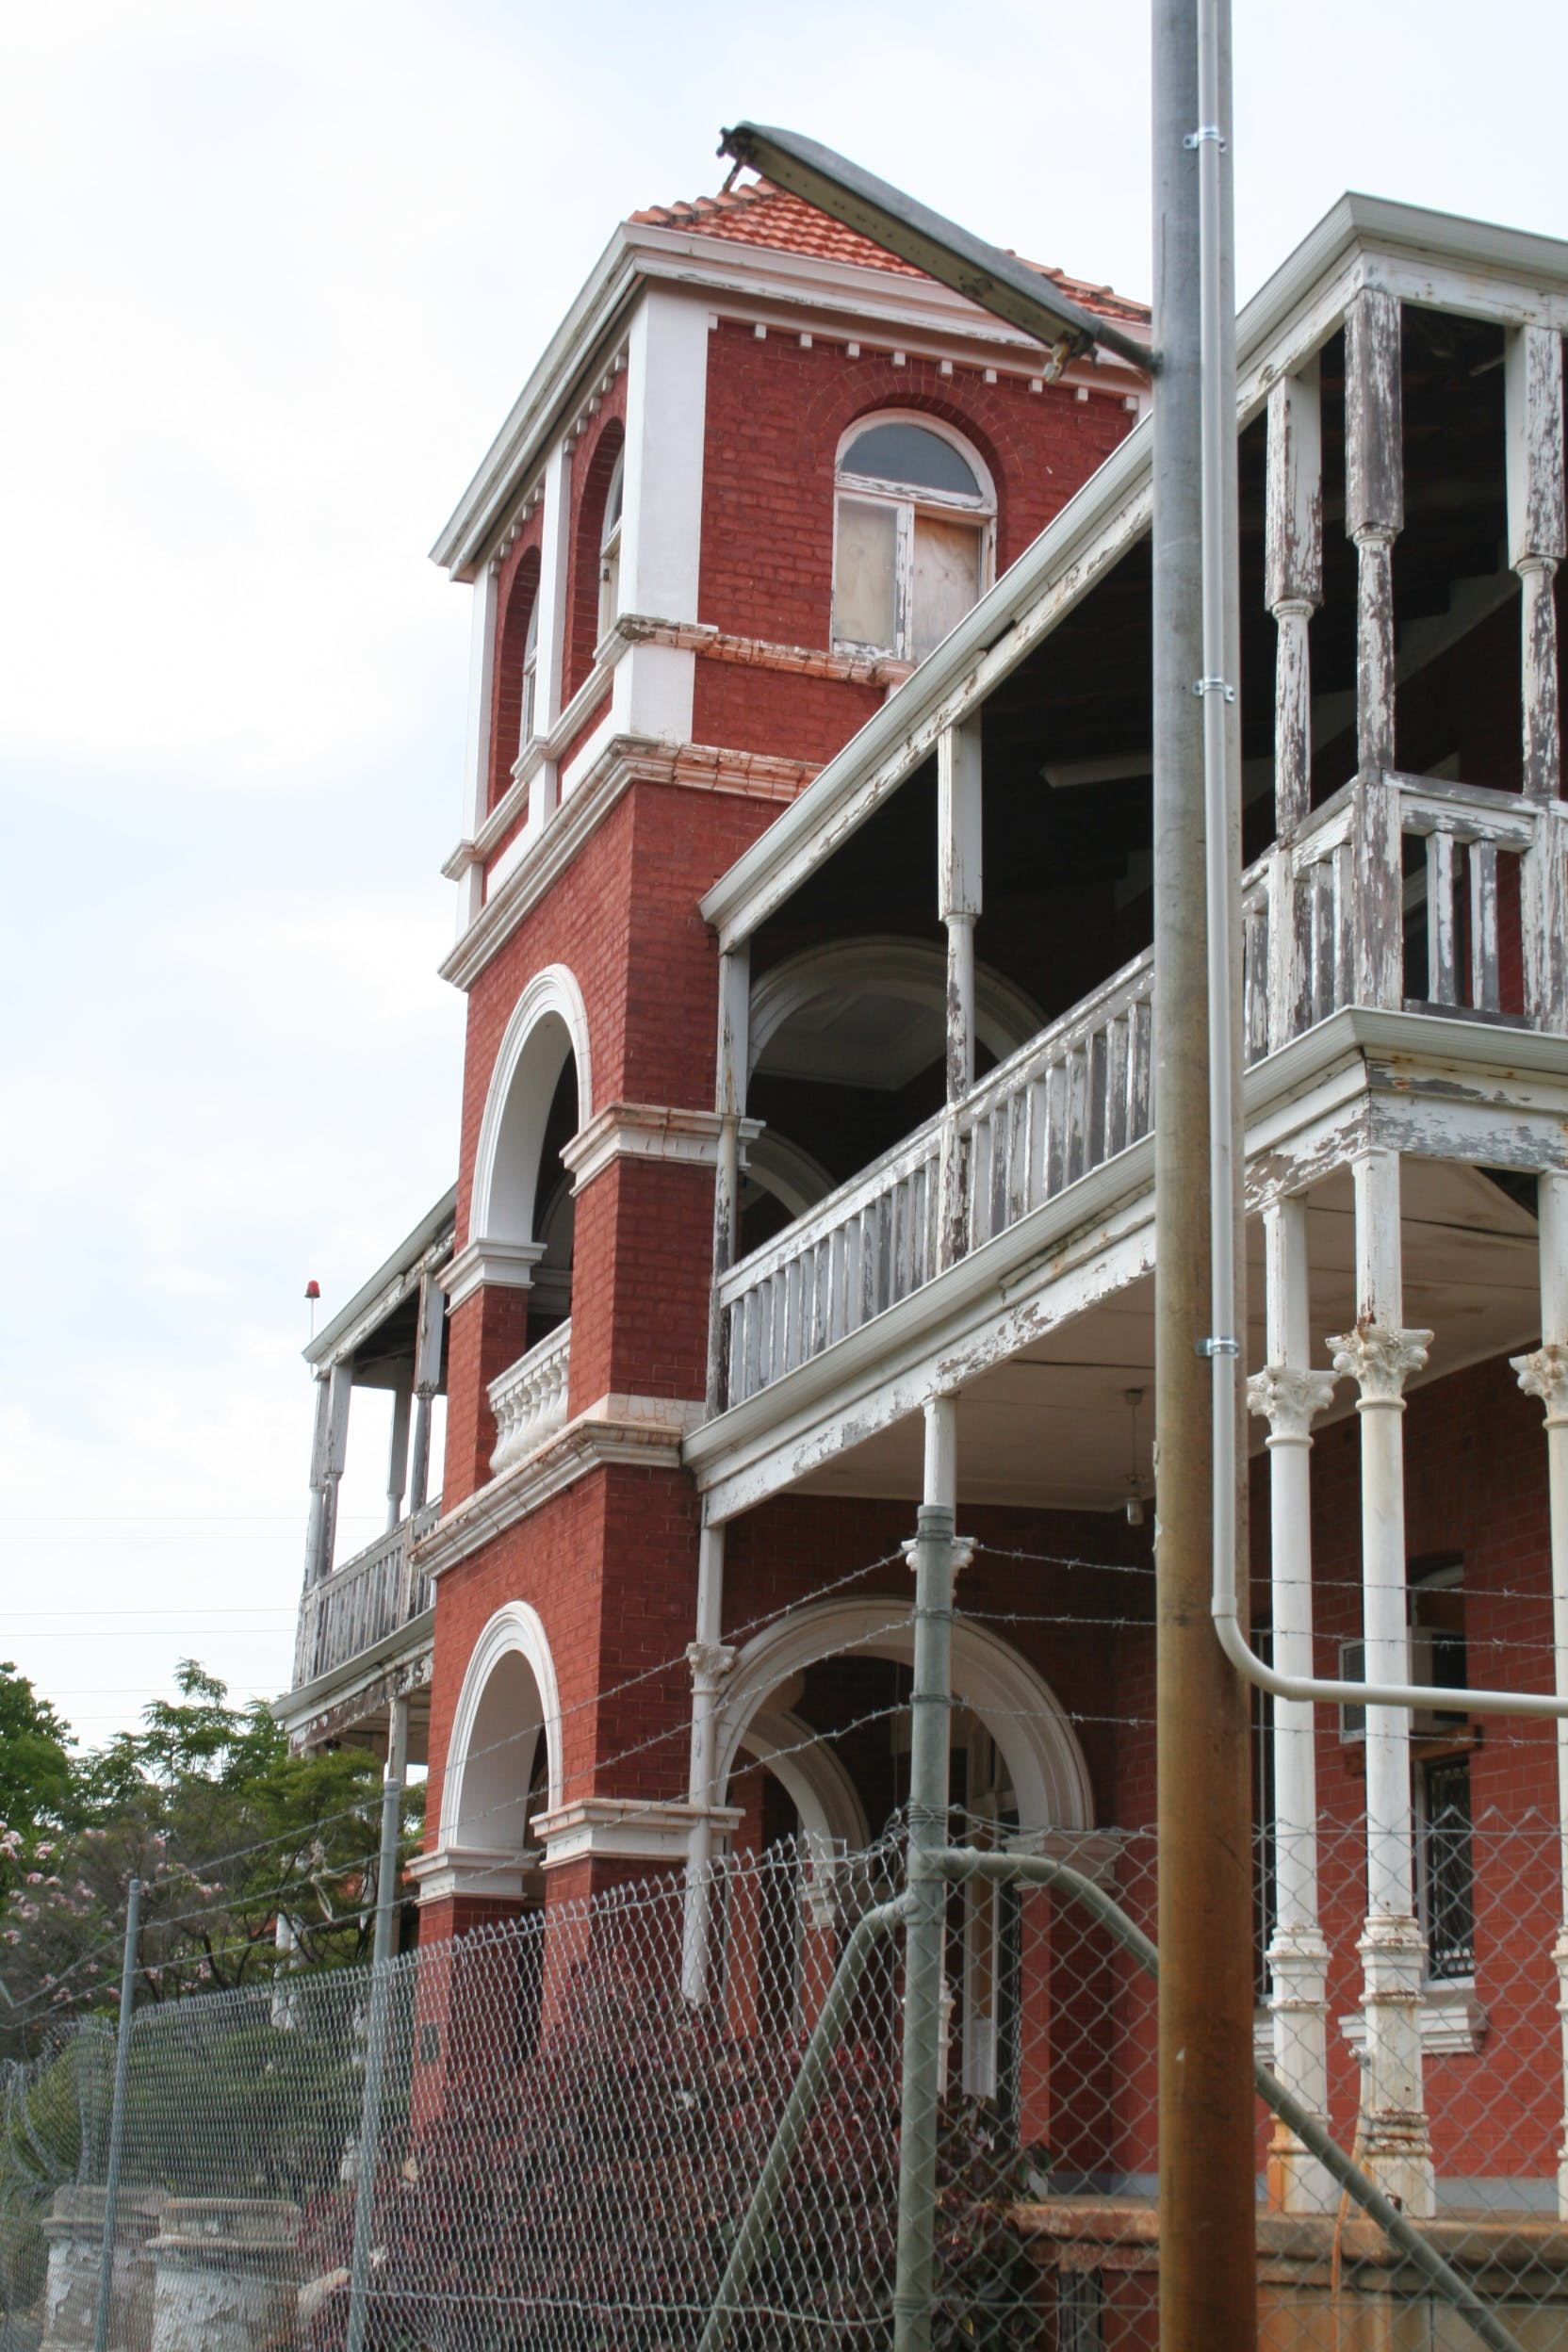 Edward Millen House in the year 2009